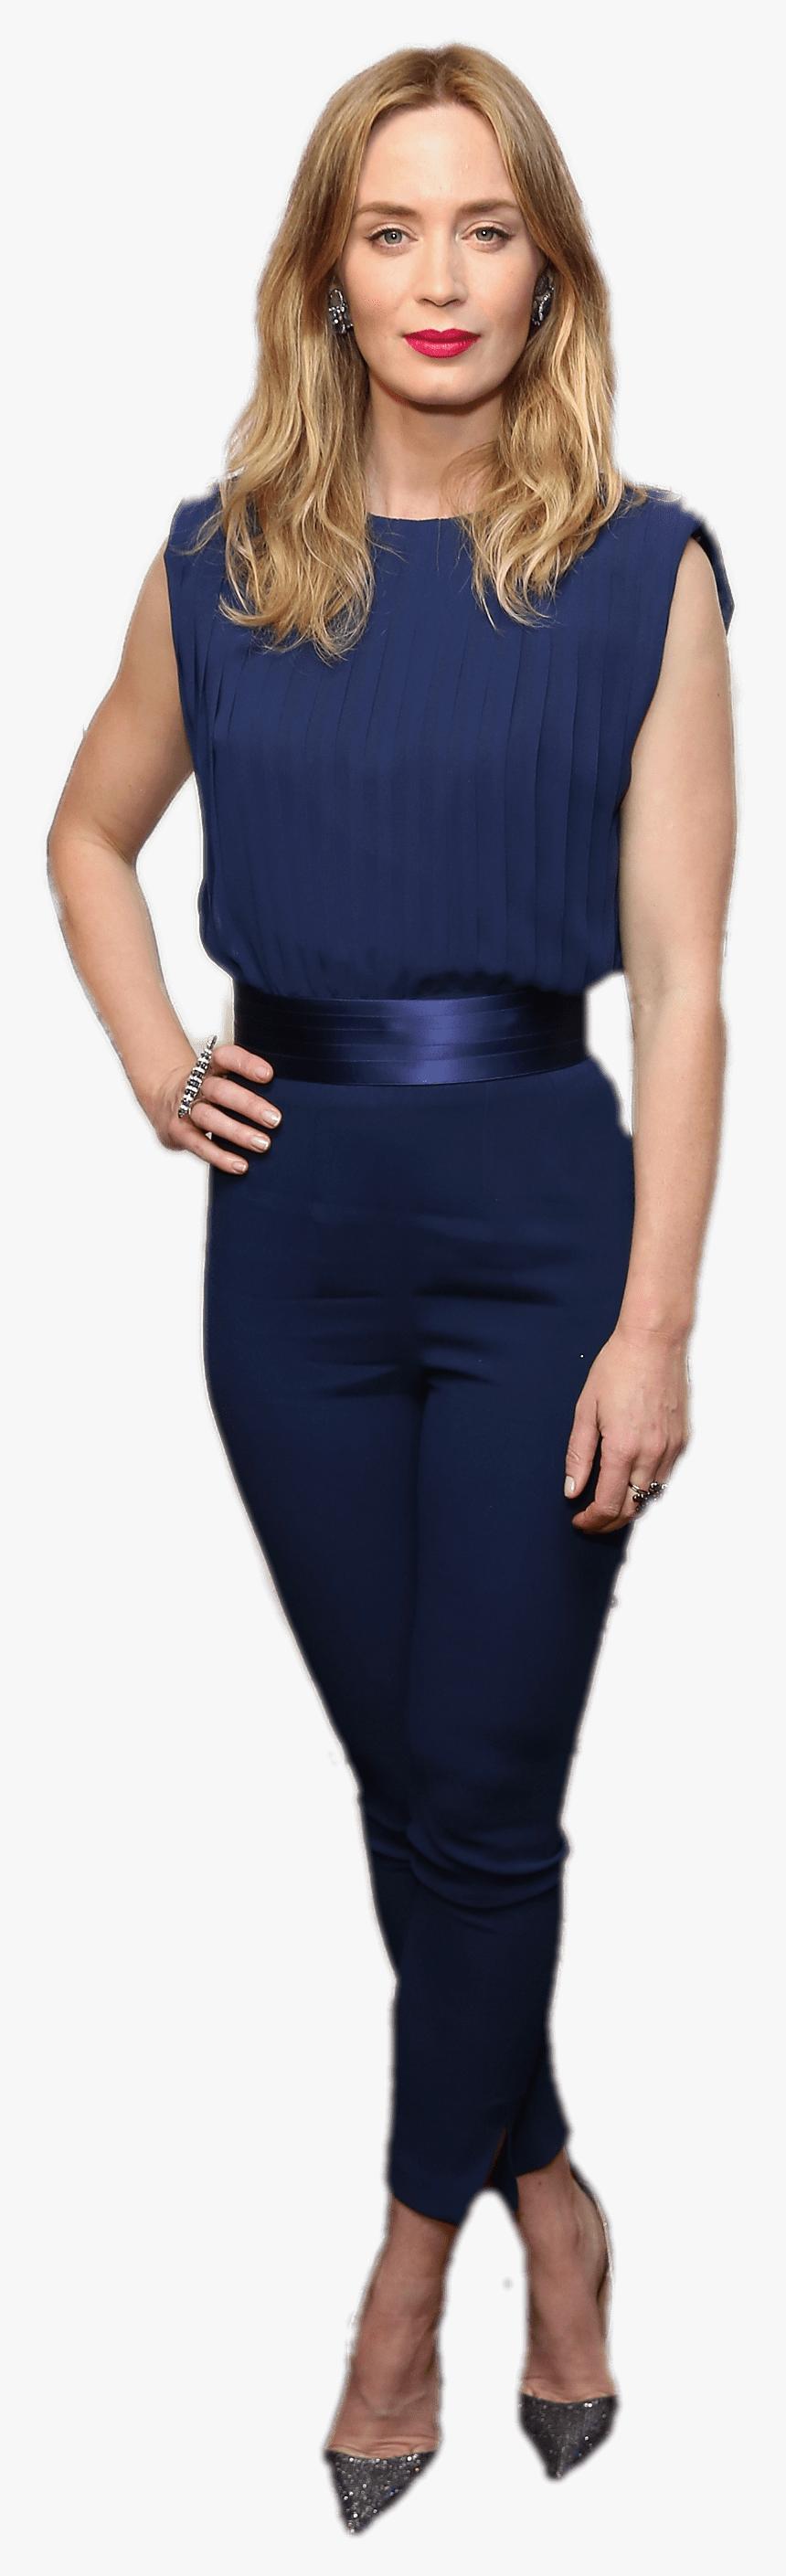 Png Emily Blunt Transparent, Png Download, Free Download